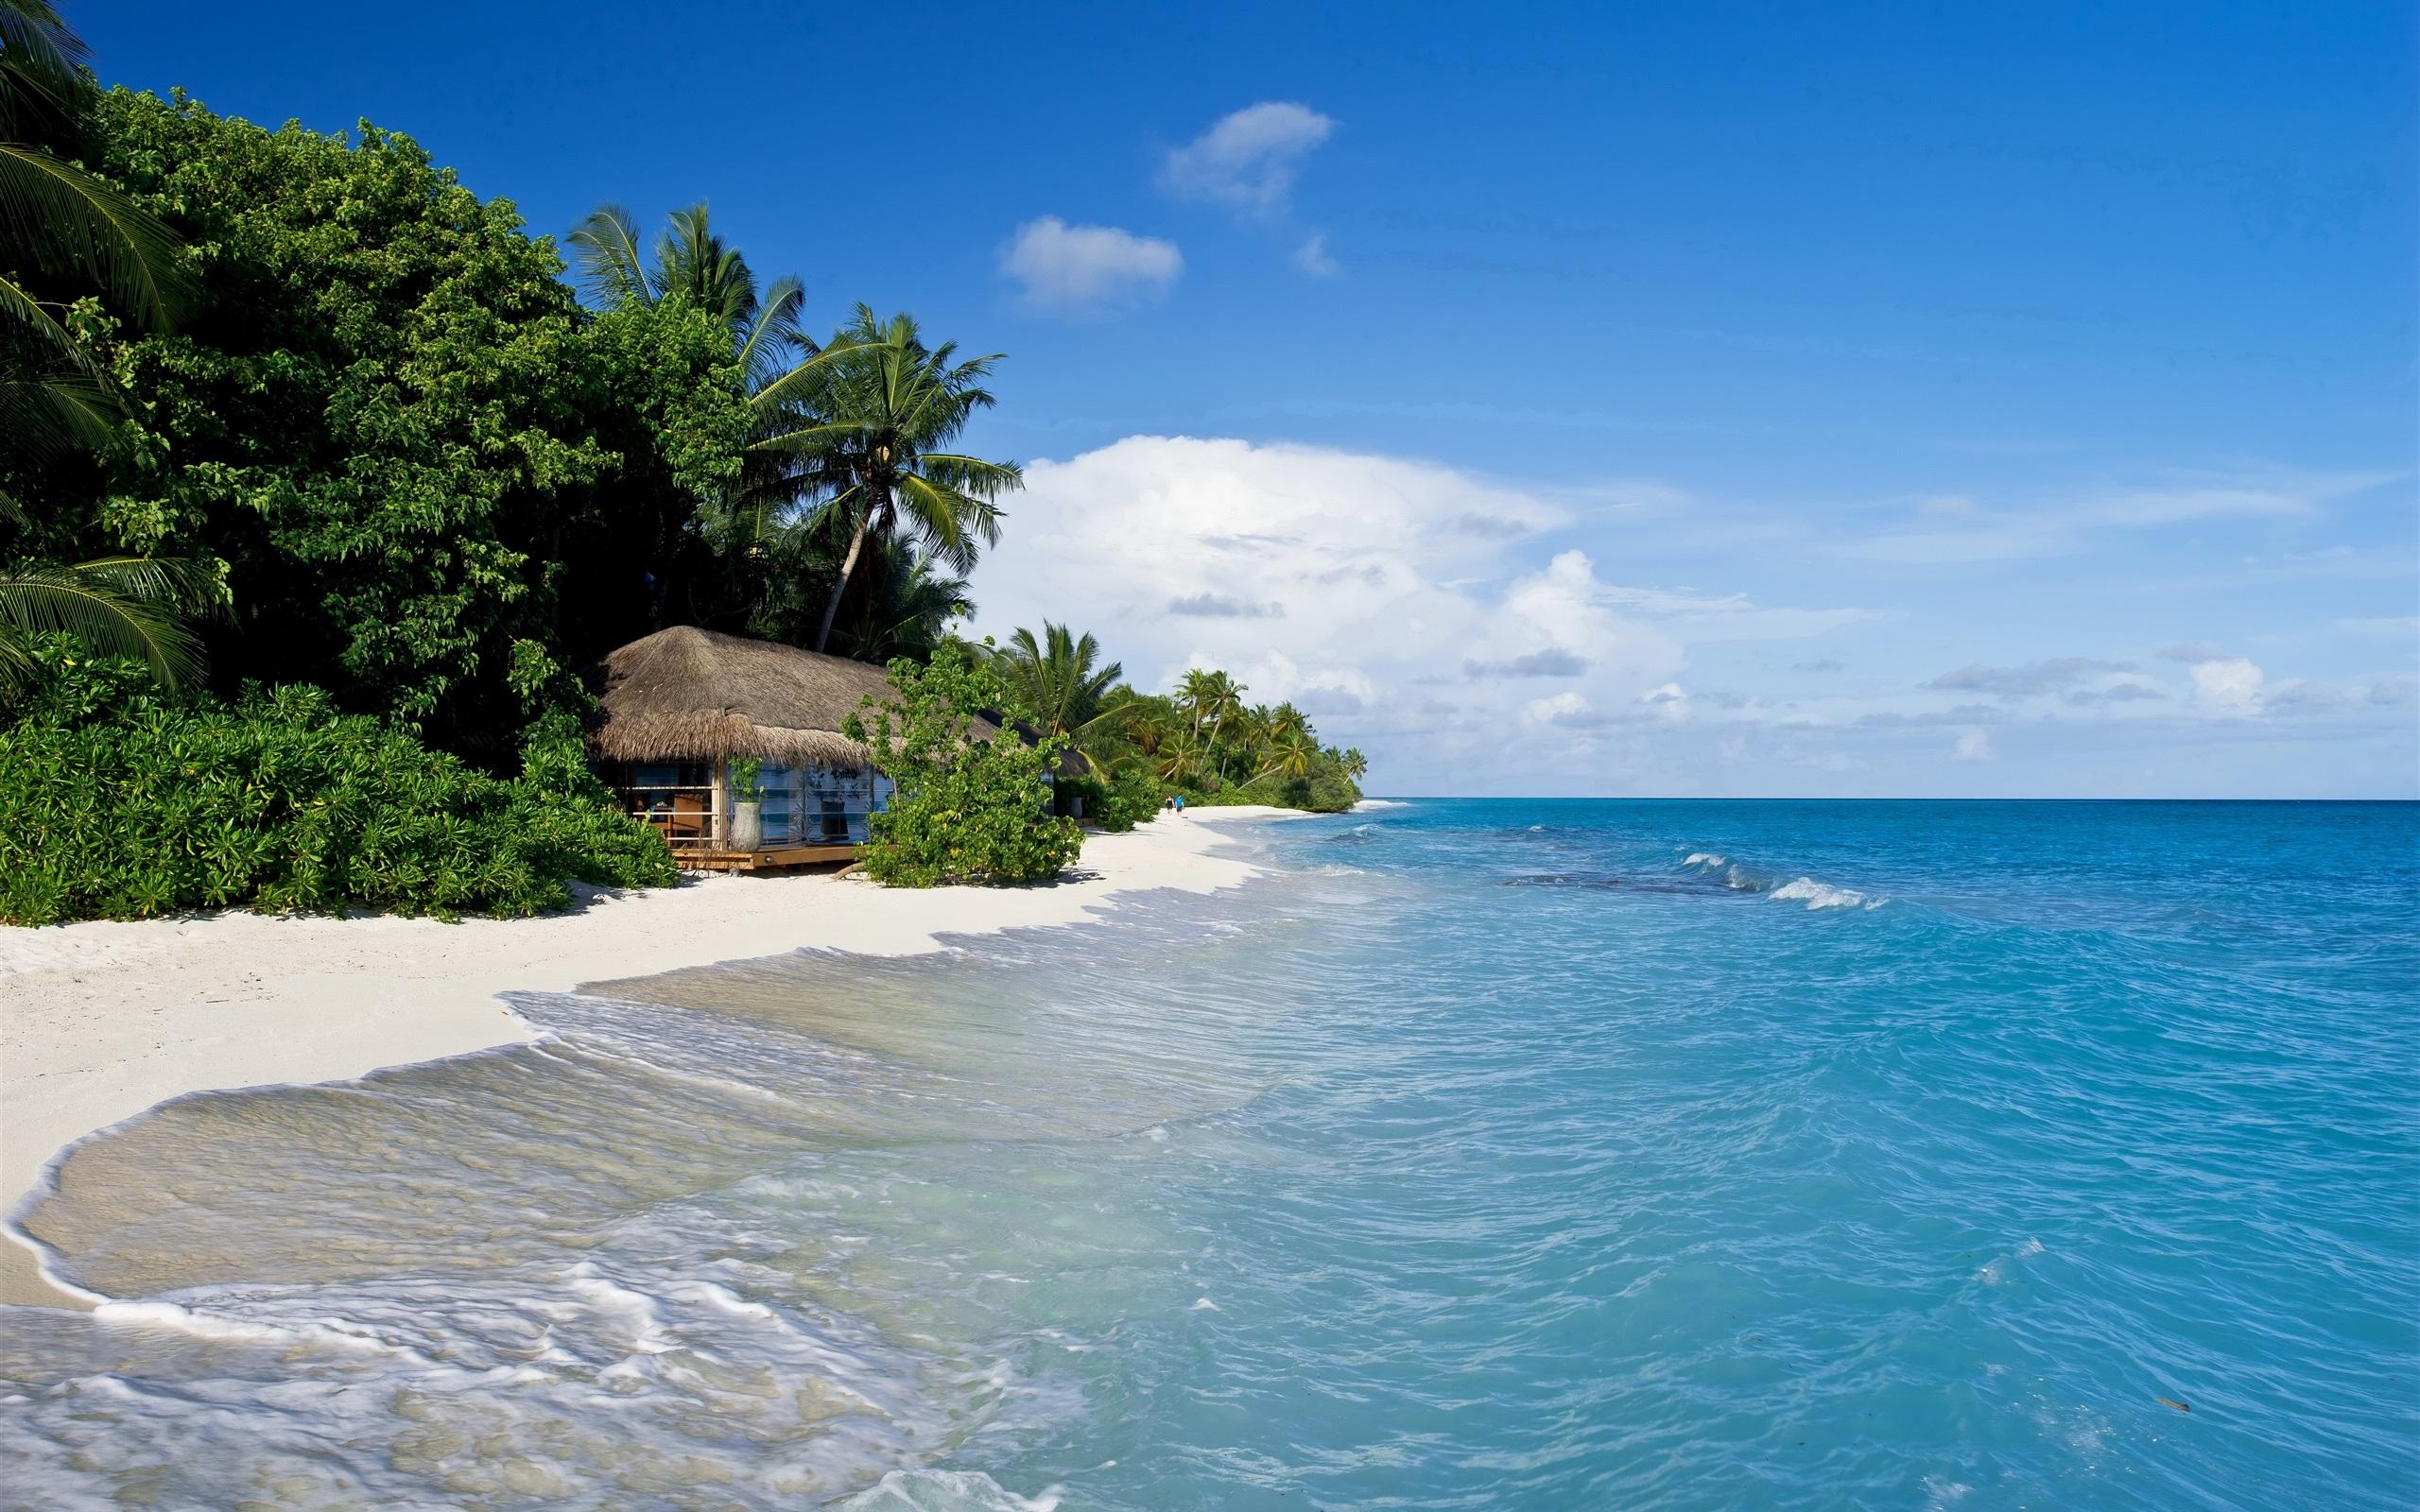 Malediven, Tropisch, Meer, Strand, Palmen, Hütte 2560x1600